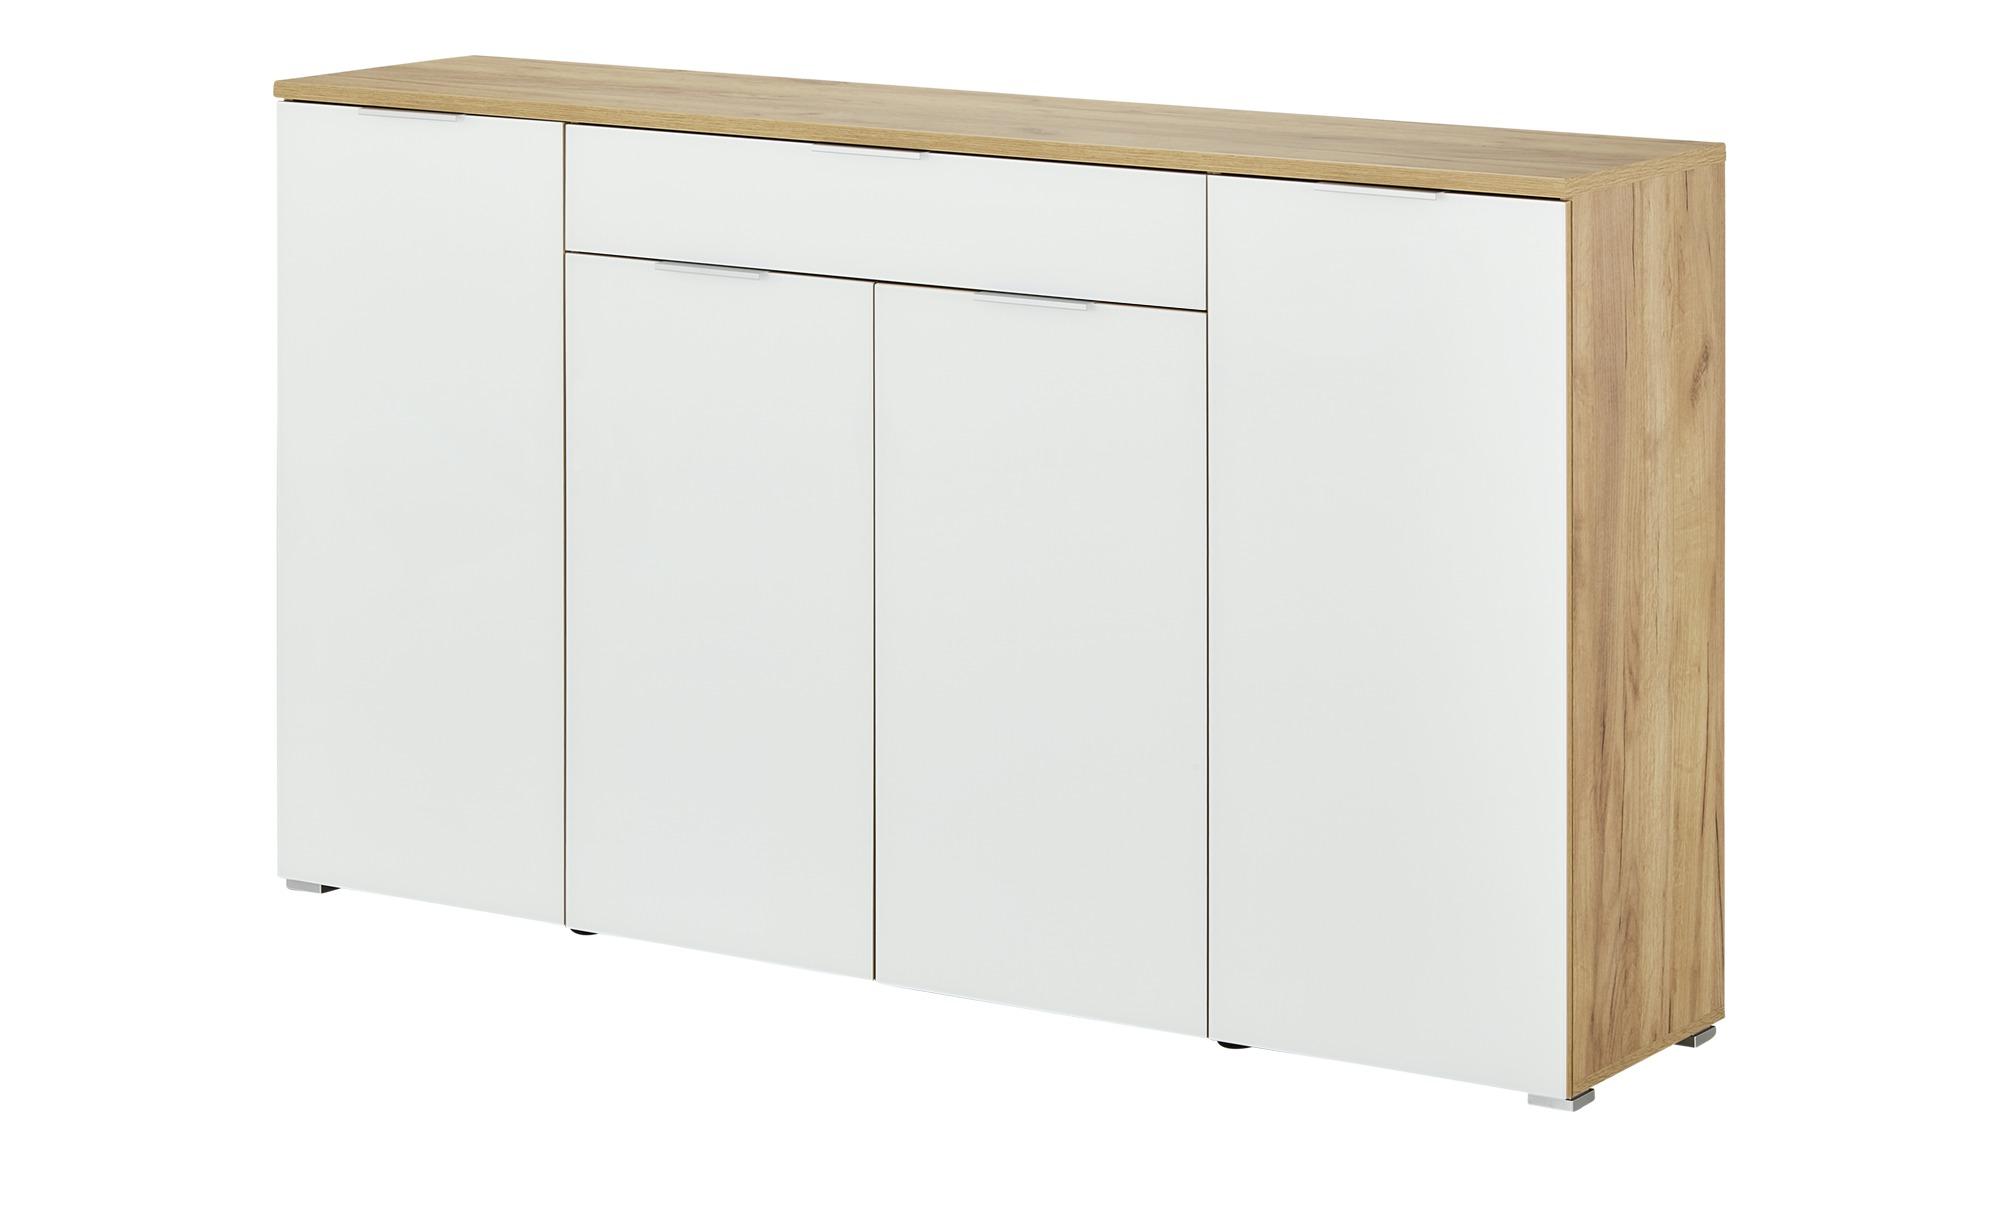 uno Sideboard  Bent ¦ holzfarben ¦ Maße (cm): B: 180 H: 105 T: 40 Kommoden & Sideboards > Kommoden - Höffner